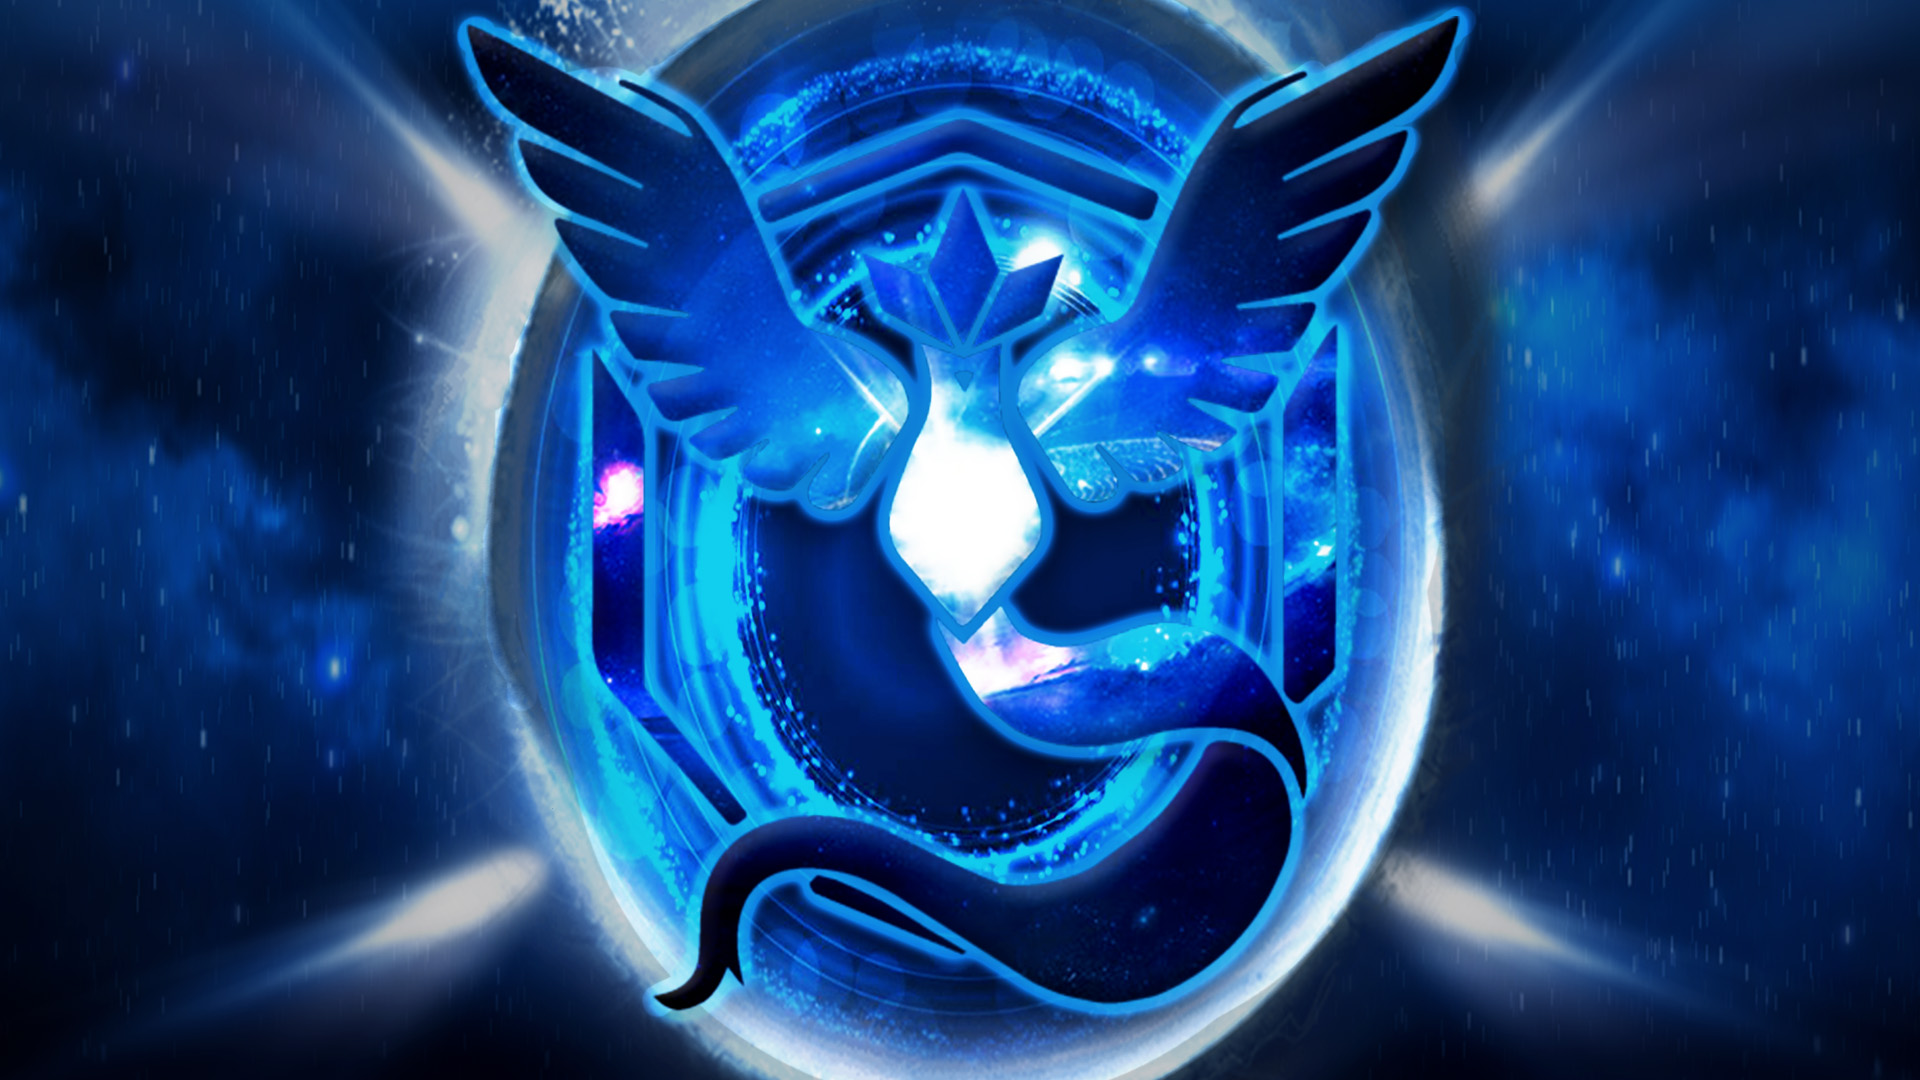 Pokémon GO HD Wallpaper   Background Image   1920x1080 ...